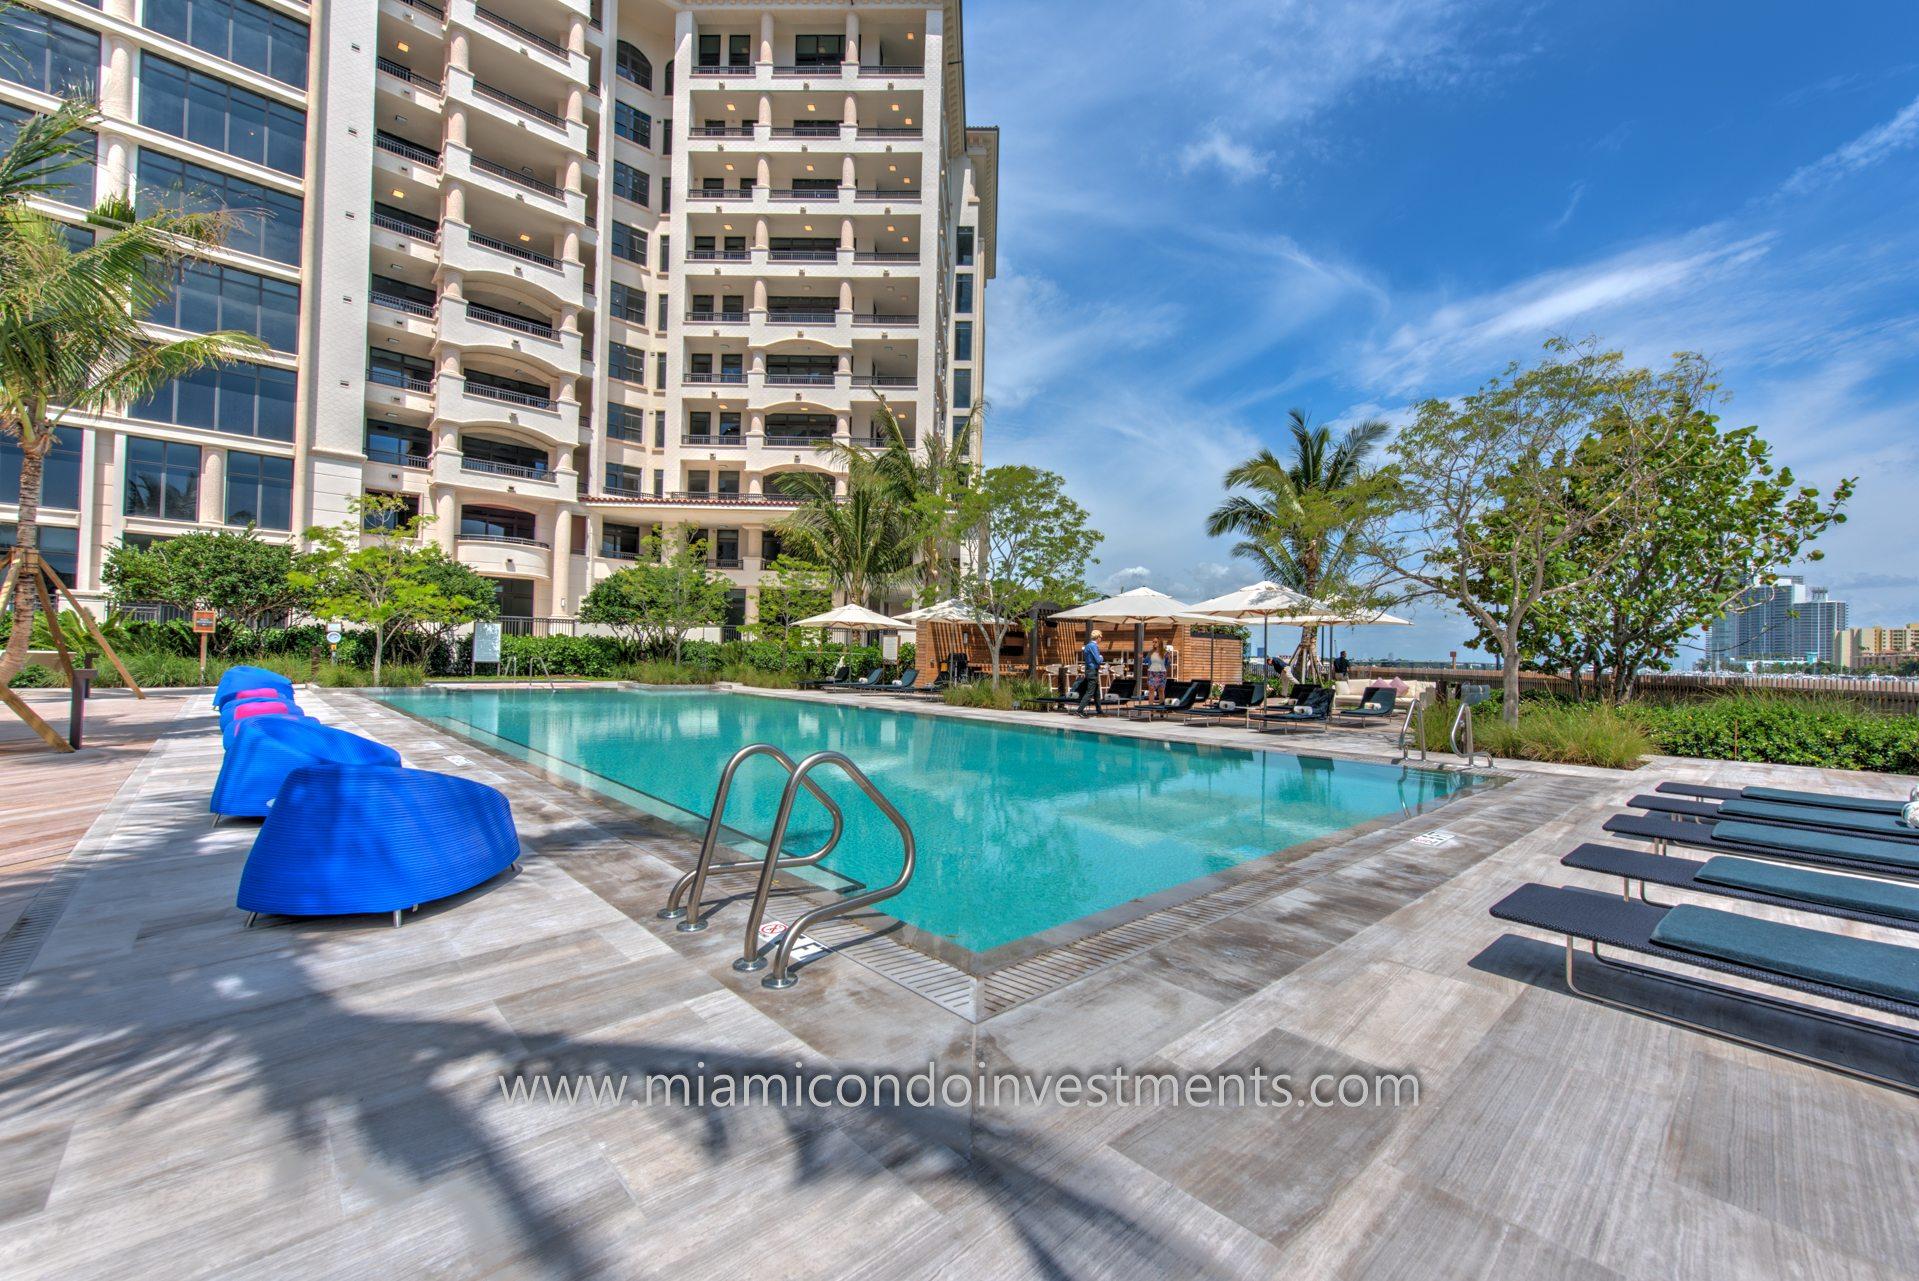 palazzo-del-sol-amenities-common-areas-11